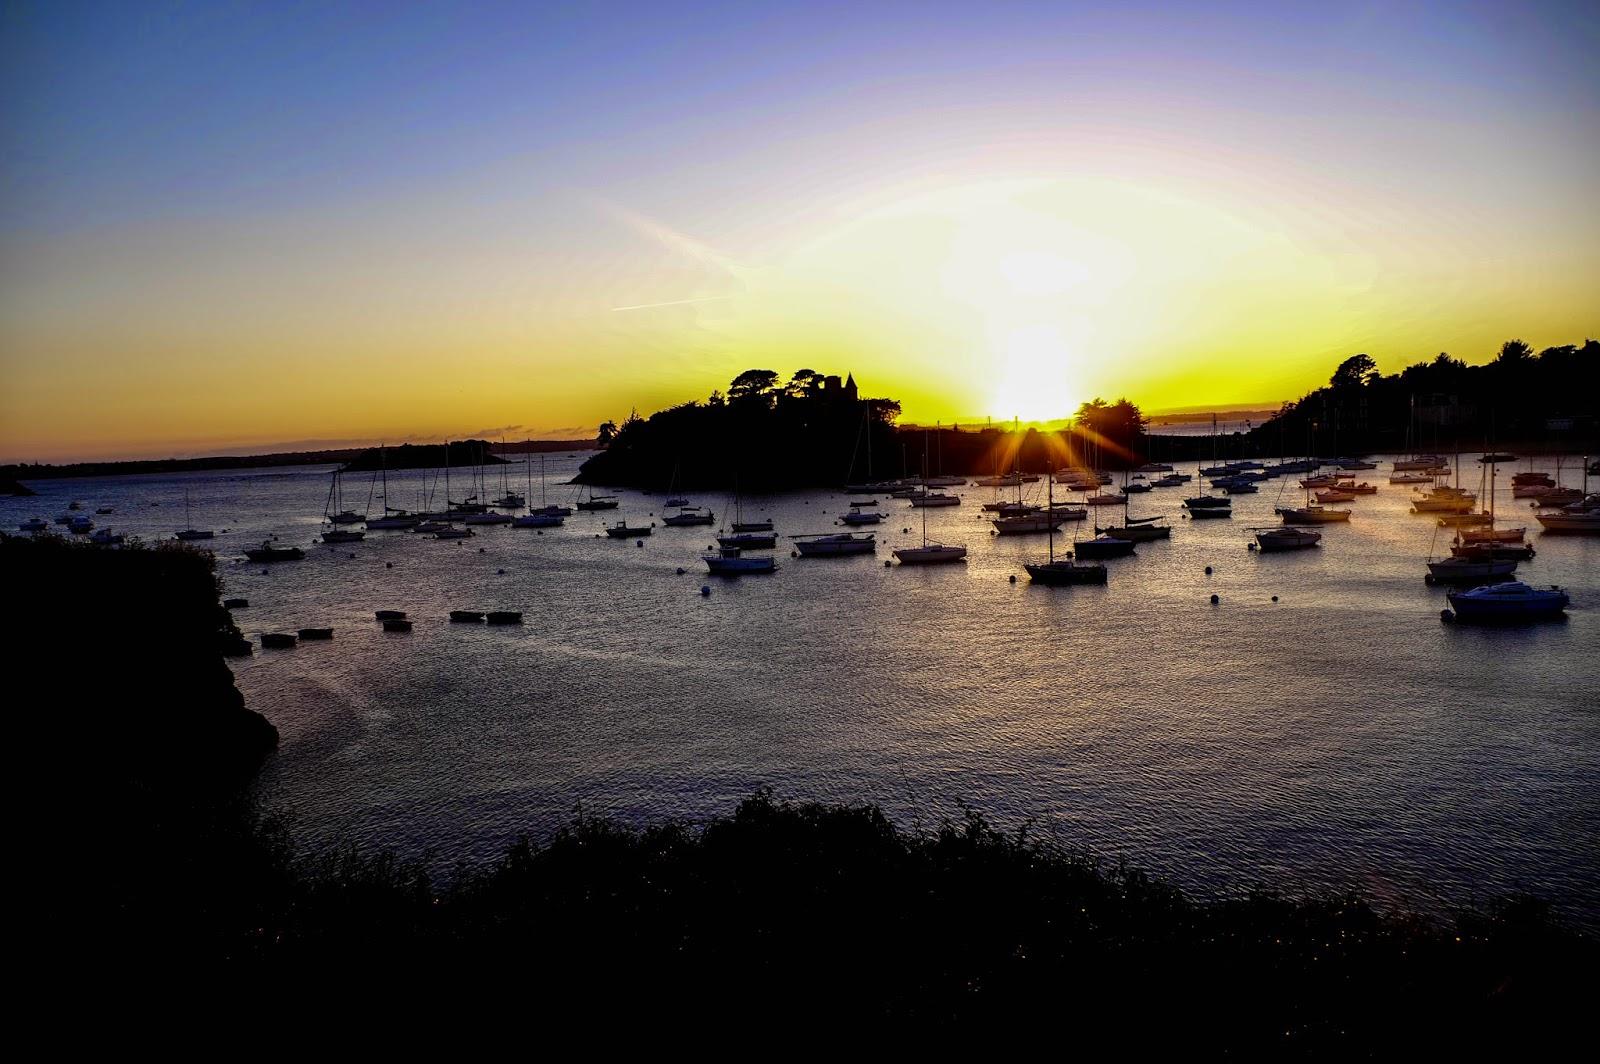 http://jerogiphotography.blogspot.com/2015/04/sunset-in-saint-briac.html